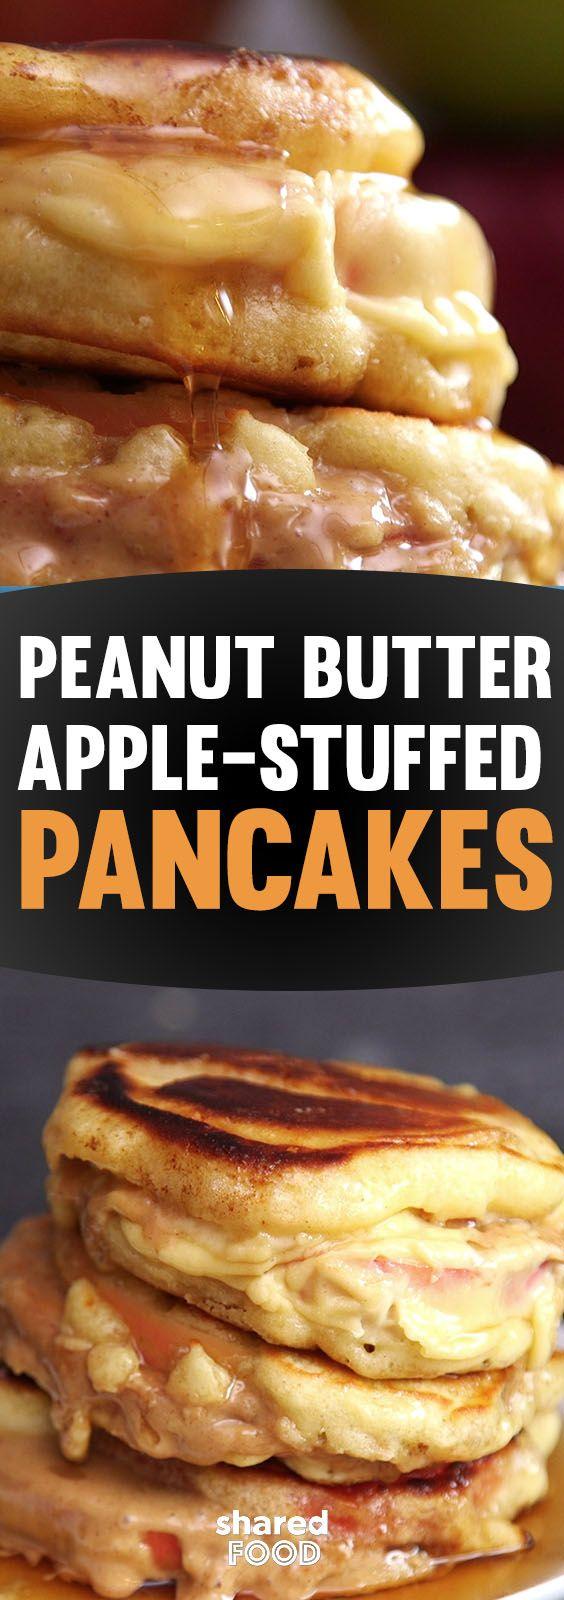 Peanut Butter Apple-Stuffed Pancakes | Egg brunch recipes ...